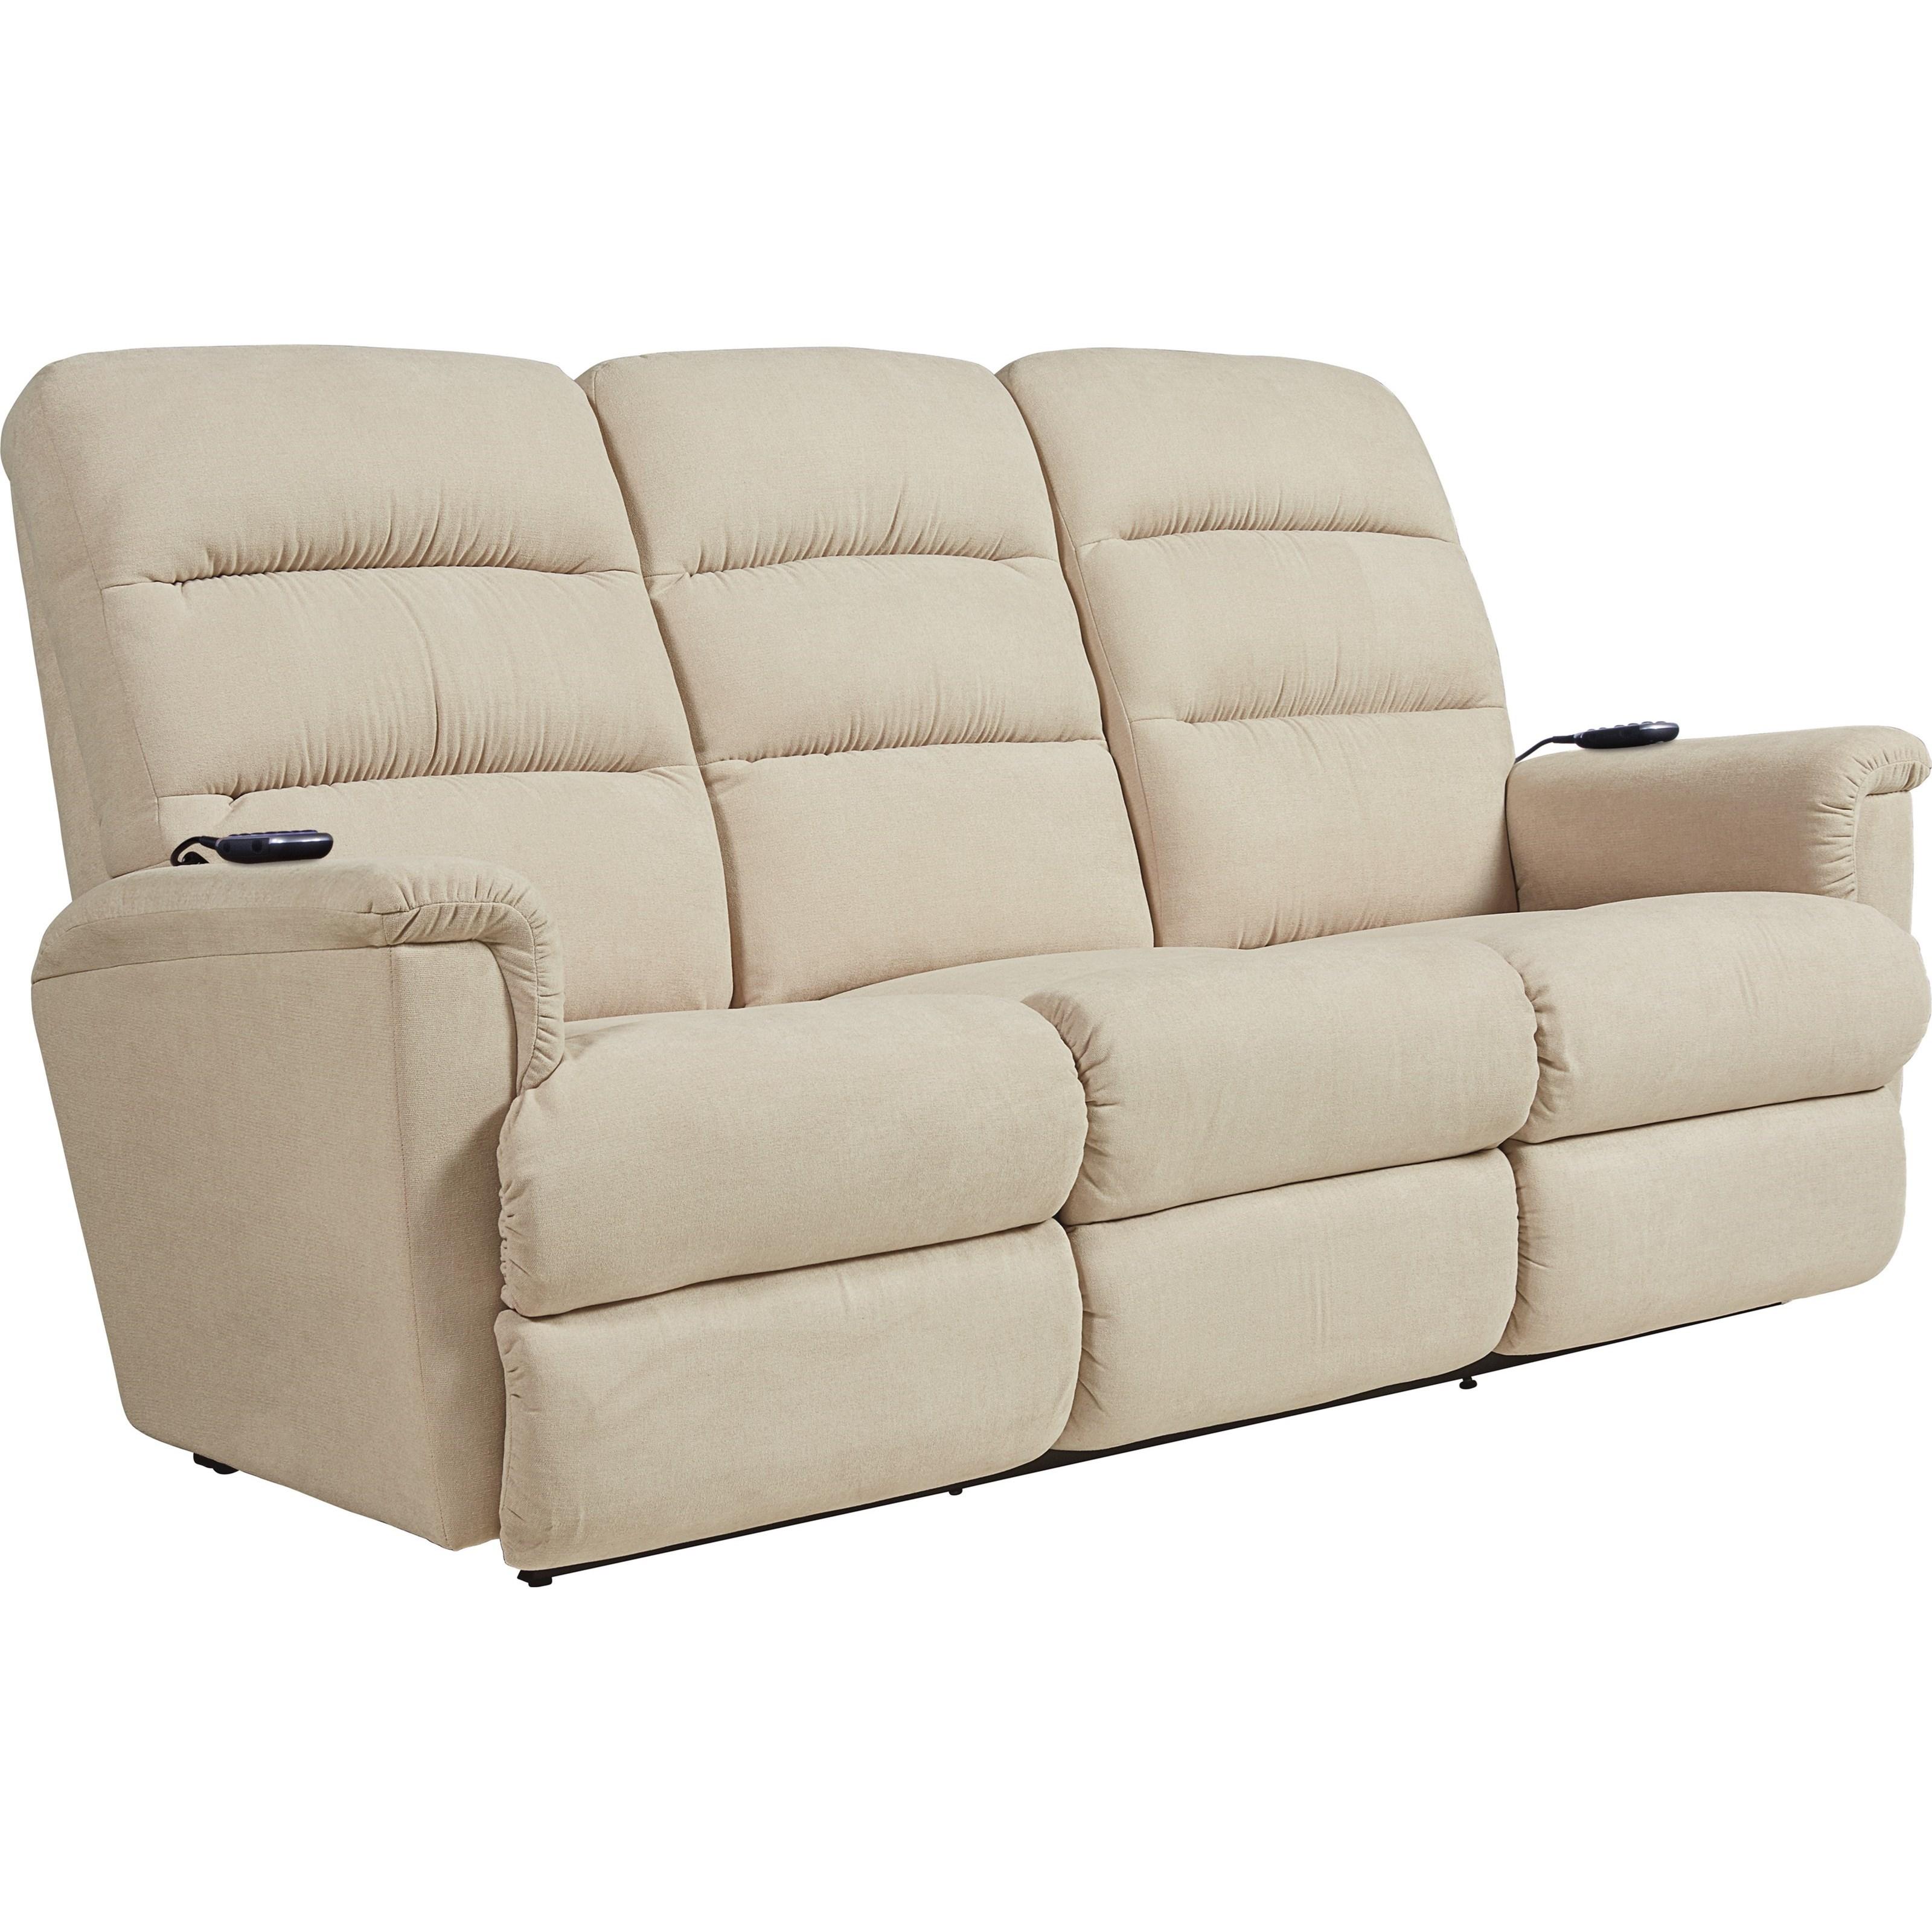 Bon La Z Boy TripoliPower Recline XRw™+ Full Reclining Sofa